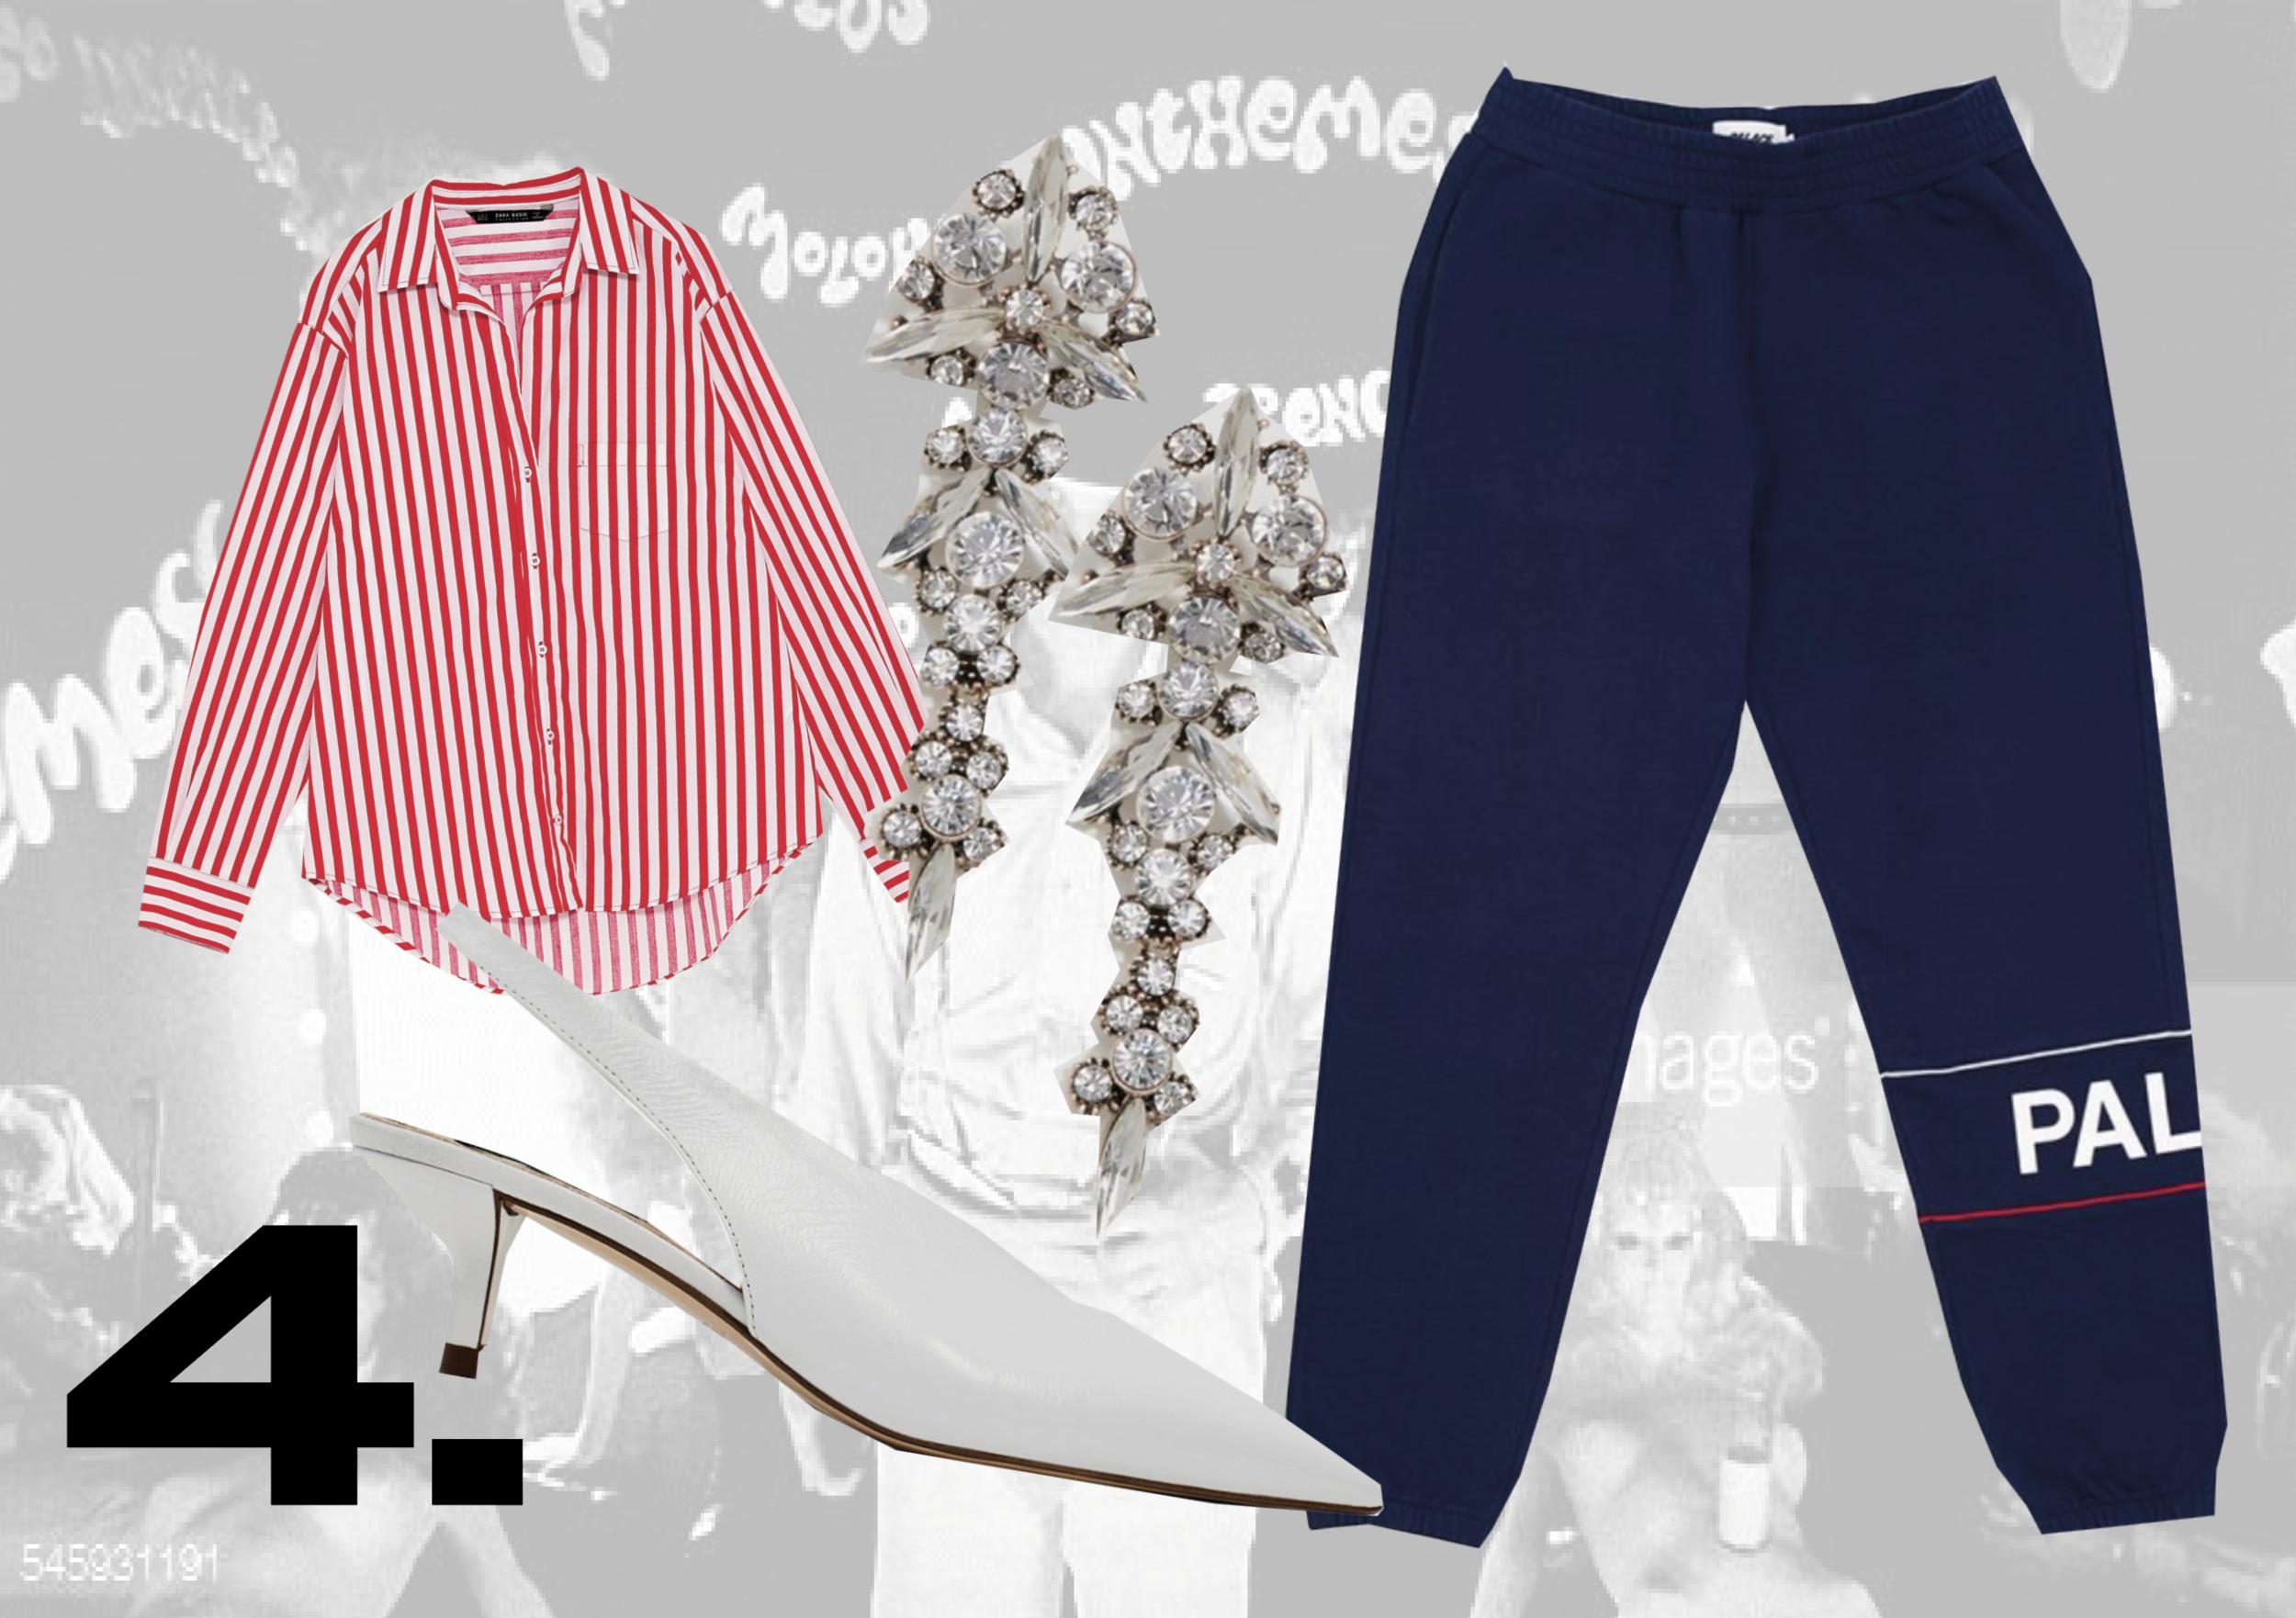 SHIRT:  Zara  | SLING-BACK HEELS:  Zara  | EARRINGS:  ASOS  | SWEATPANTS:  Palace Skateboards